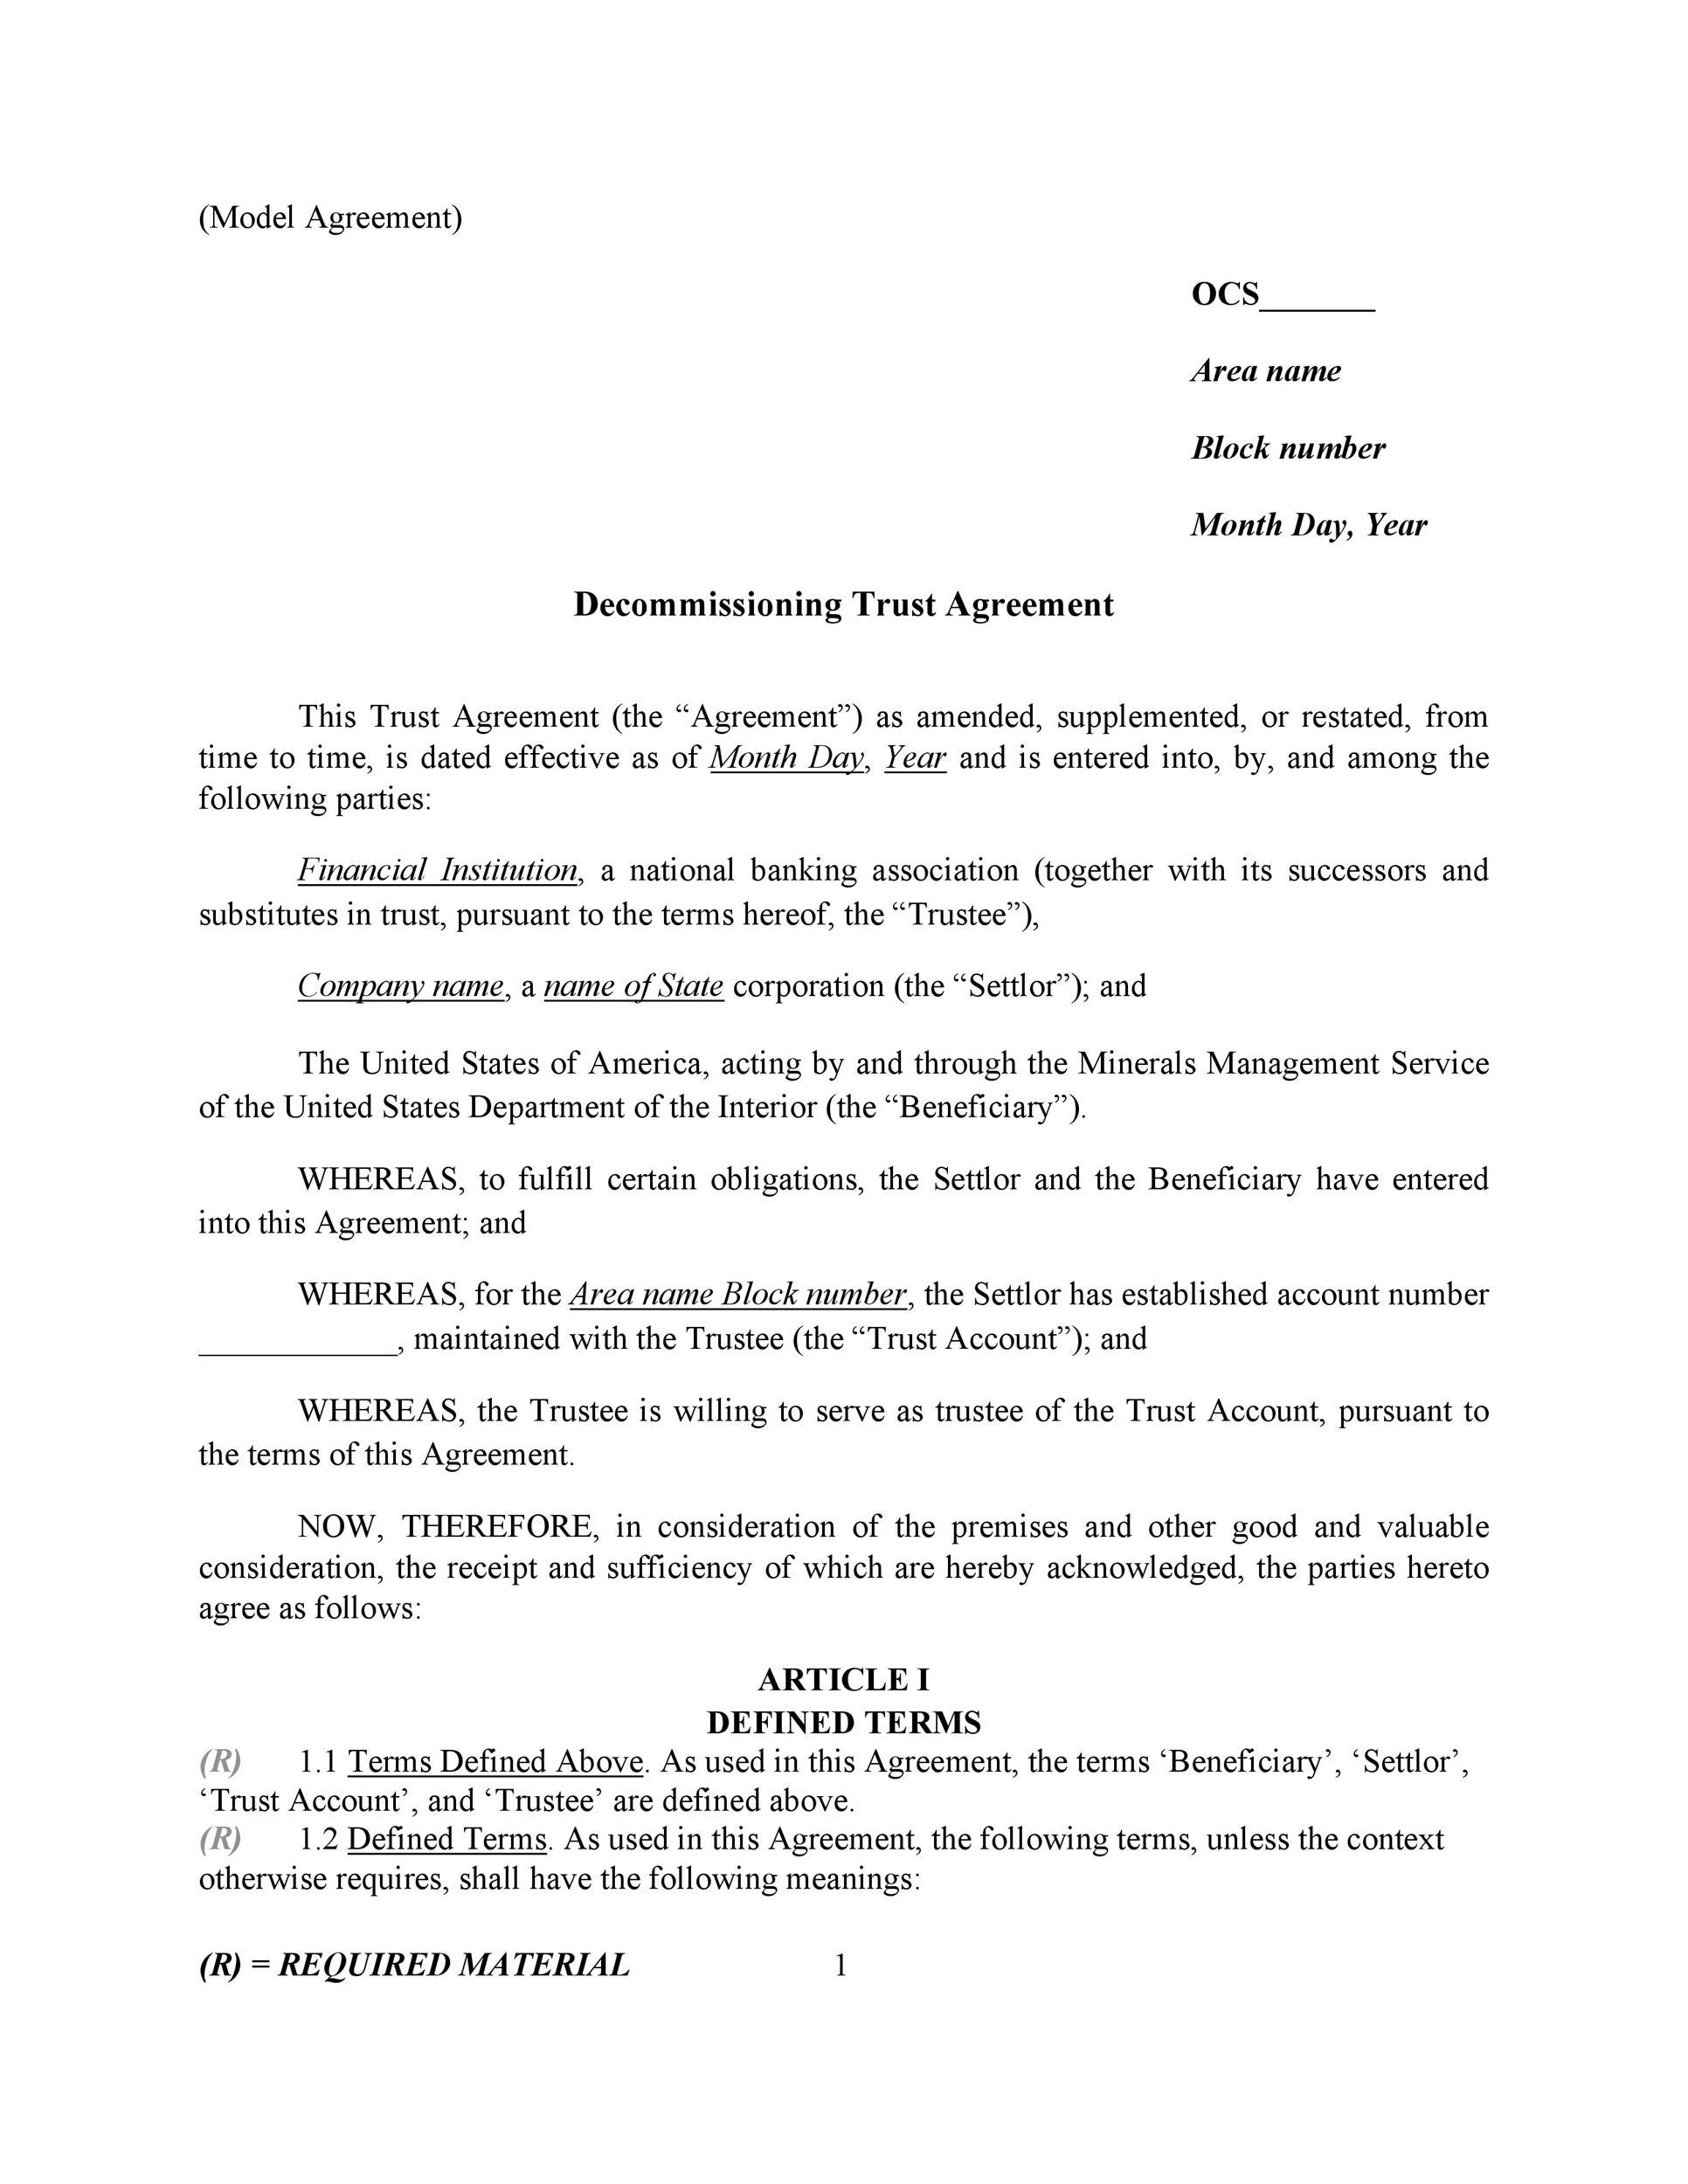 Free trust agreement 11